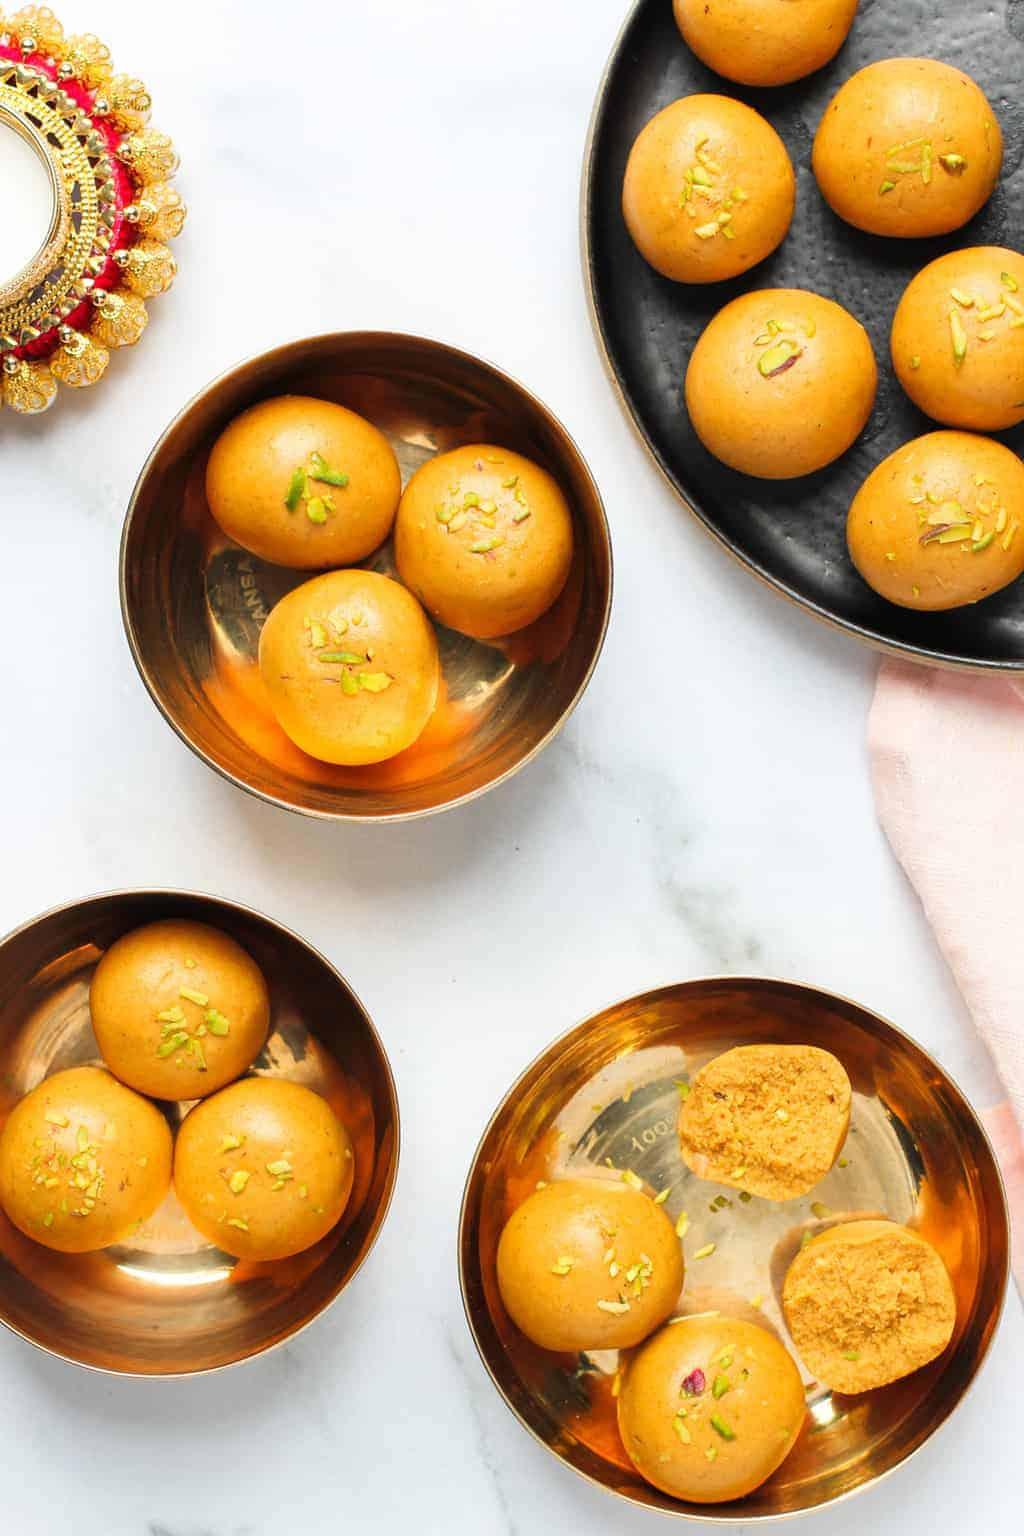 Besan laddu served in small brass plates